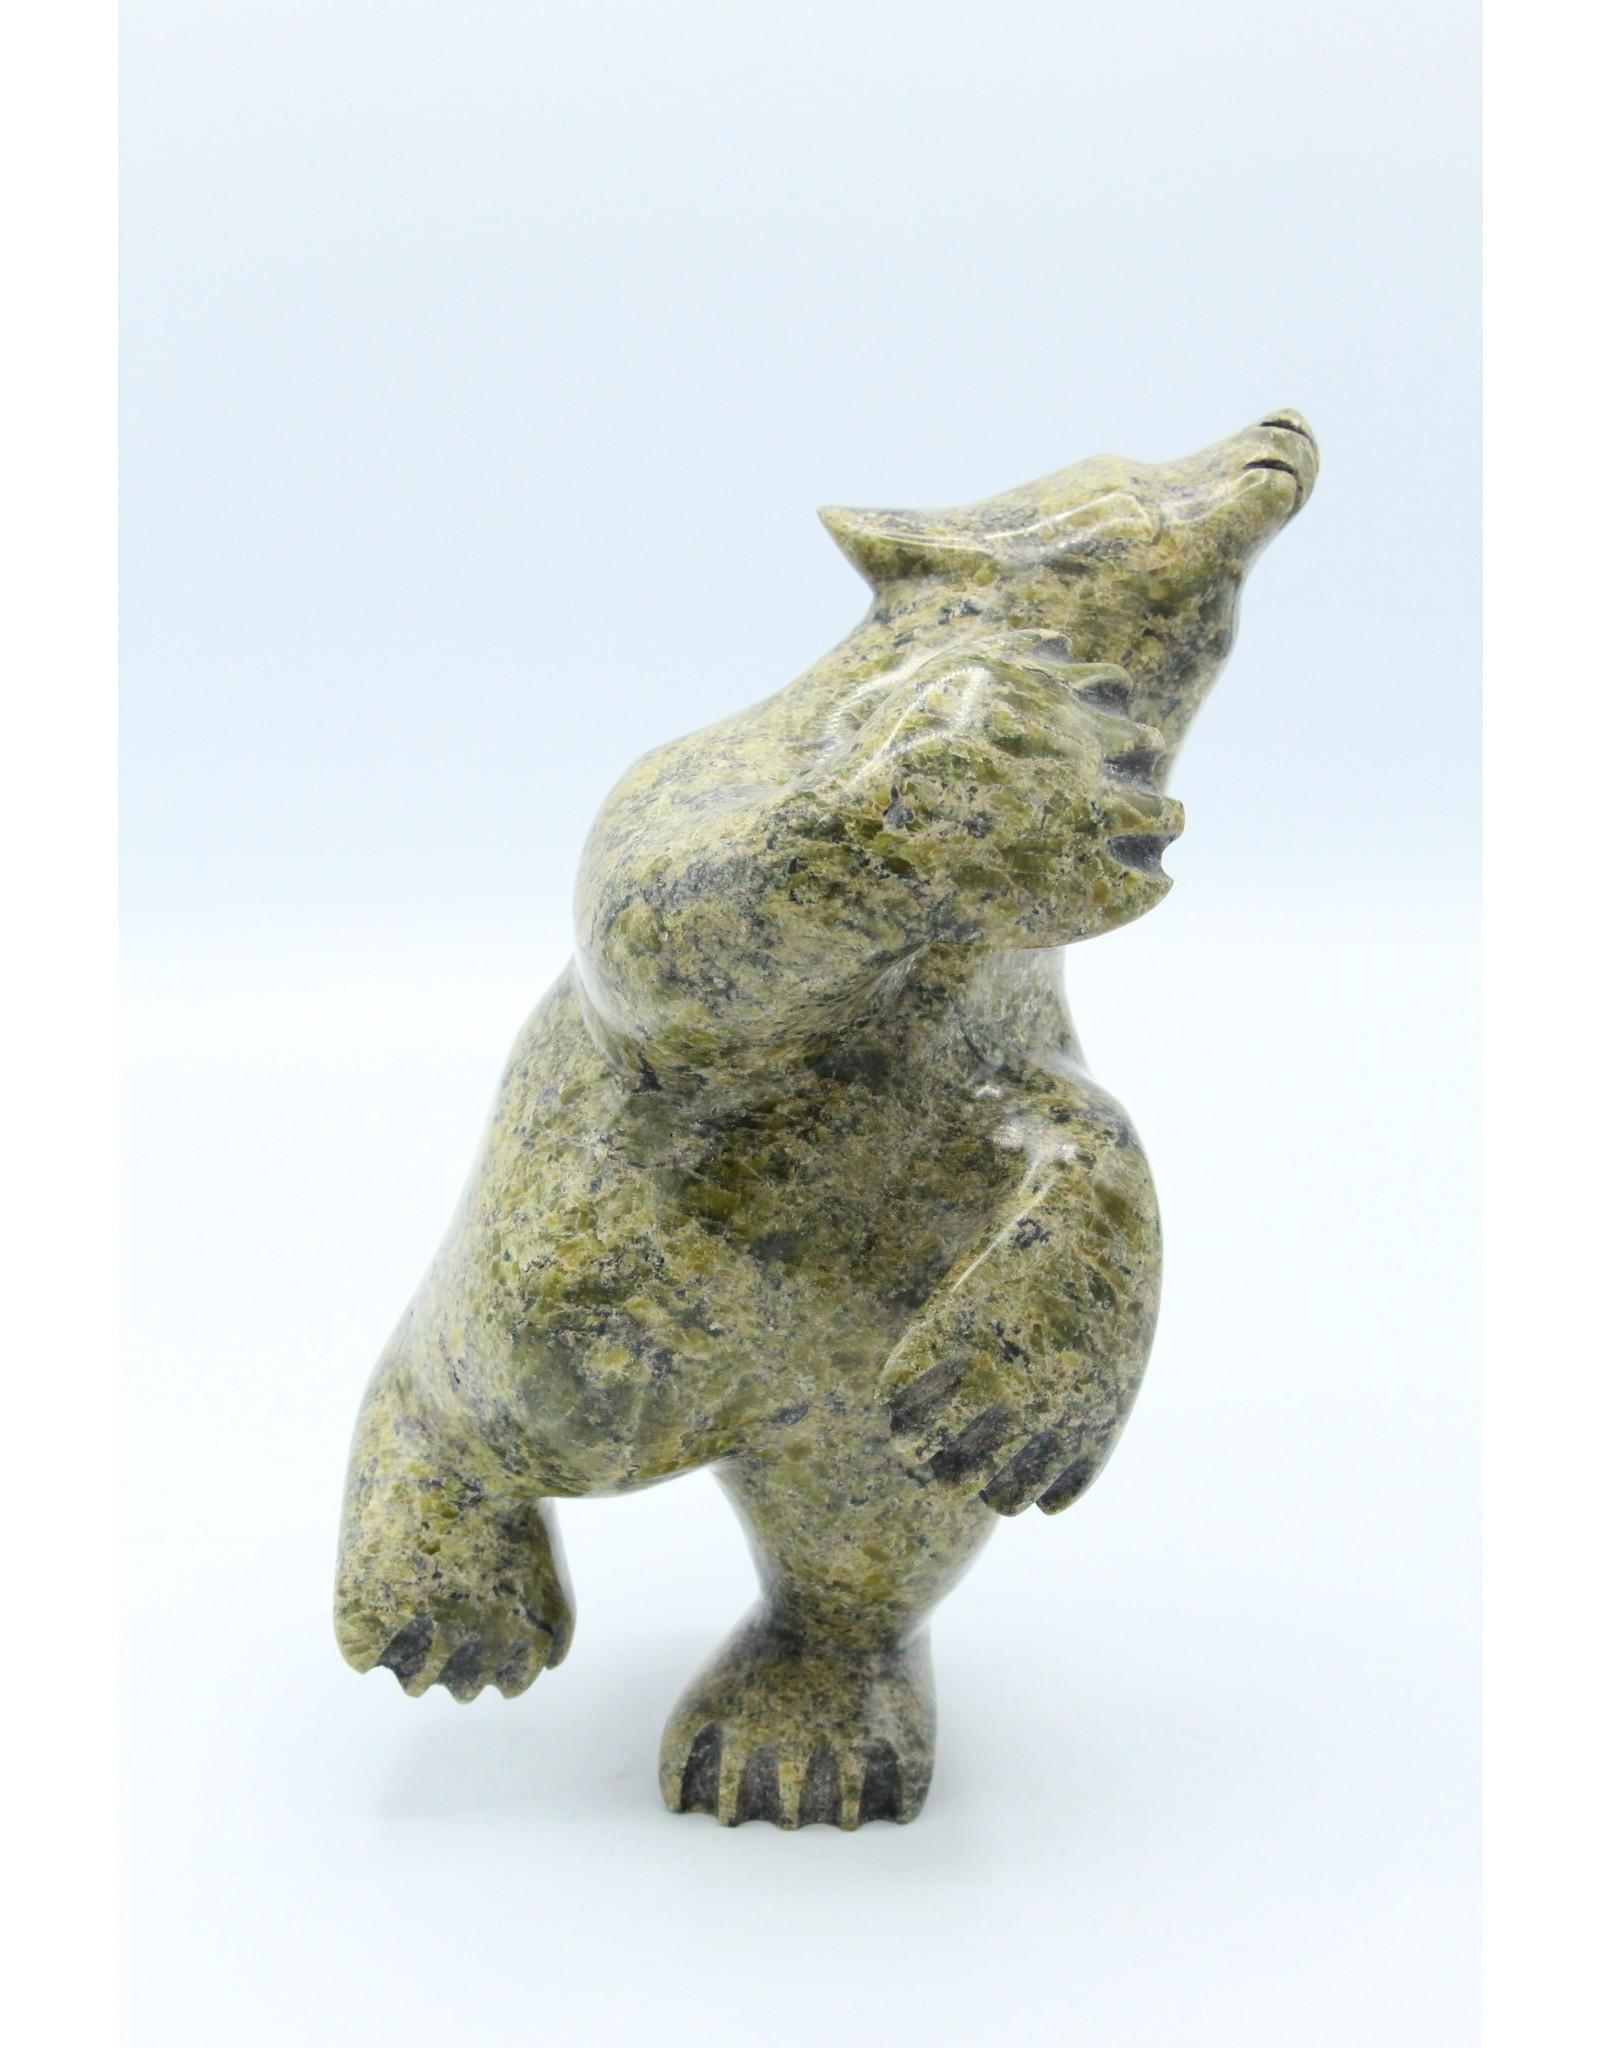 57370 Dancing Bear by Ottokie Samayualie